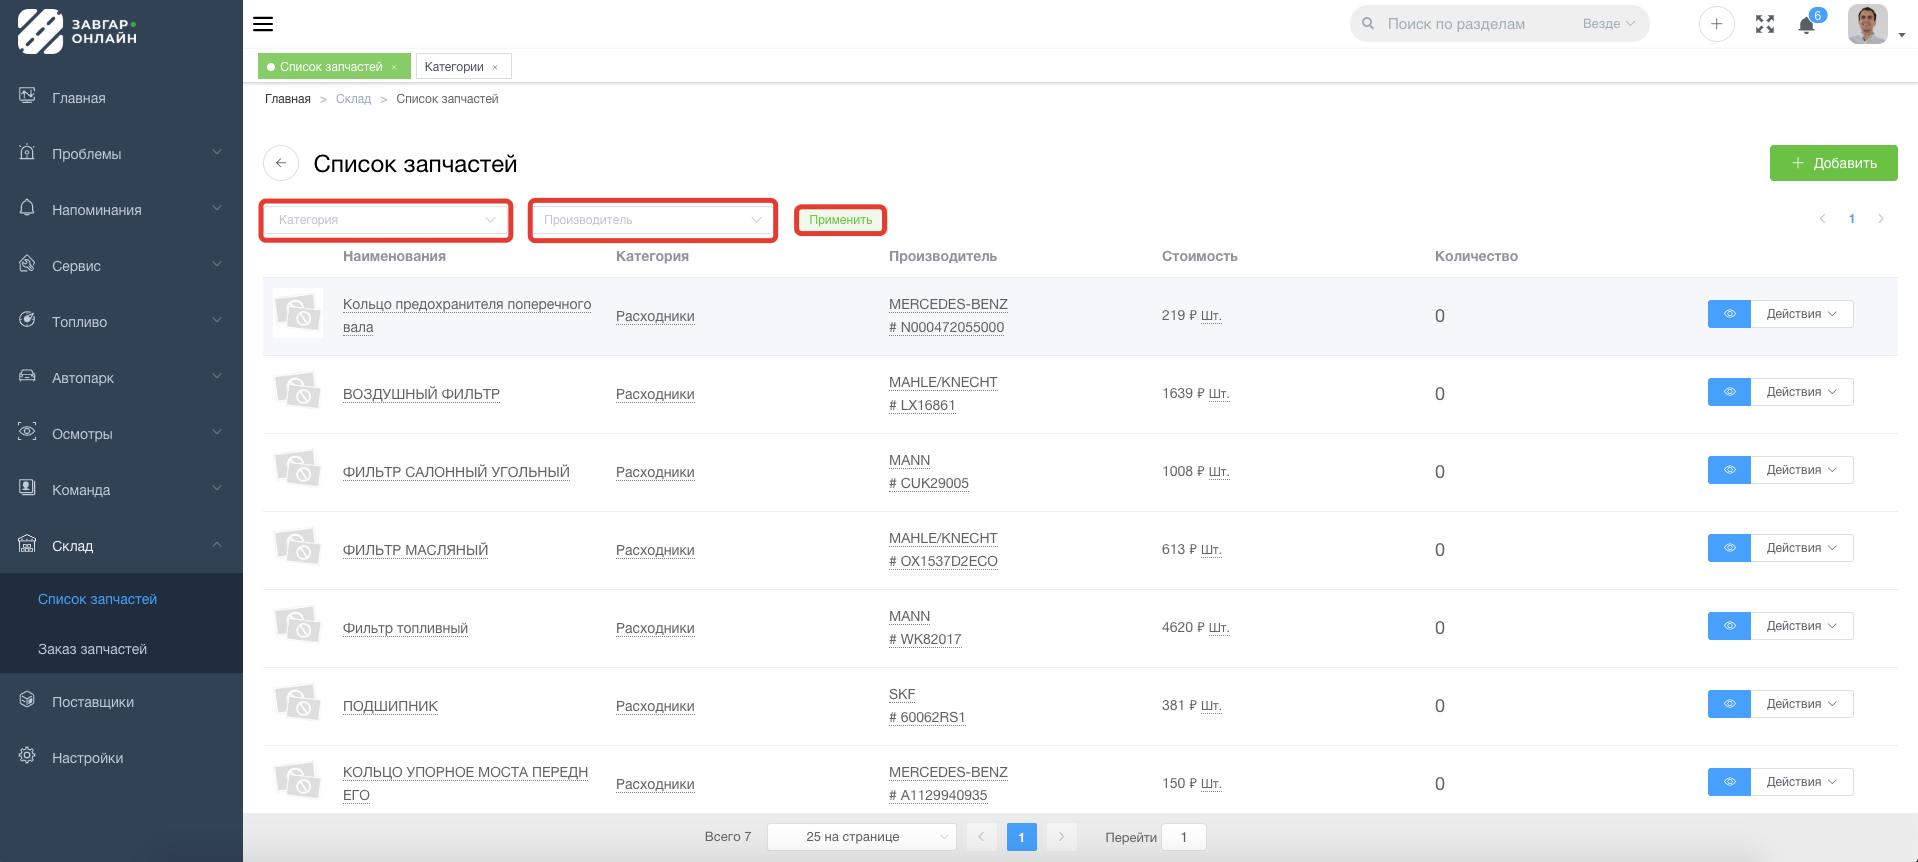 Список запчастей в системе Завгар Онлайн